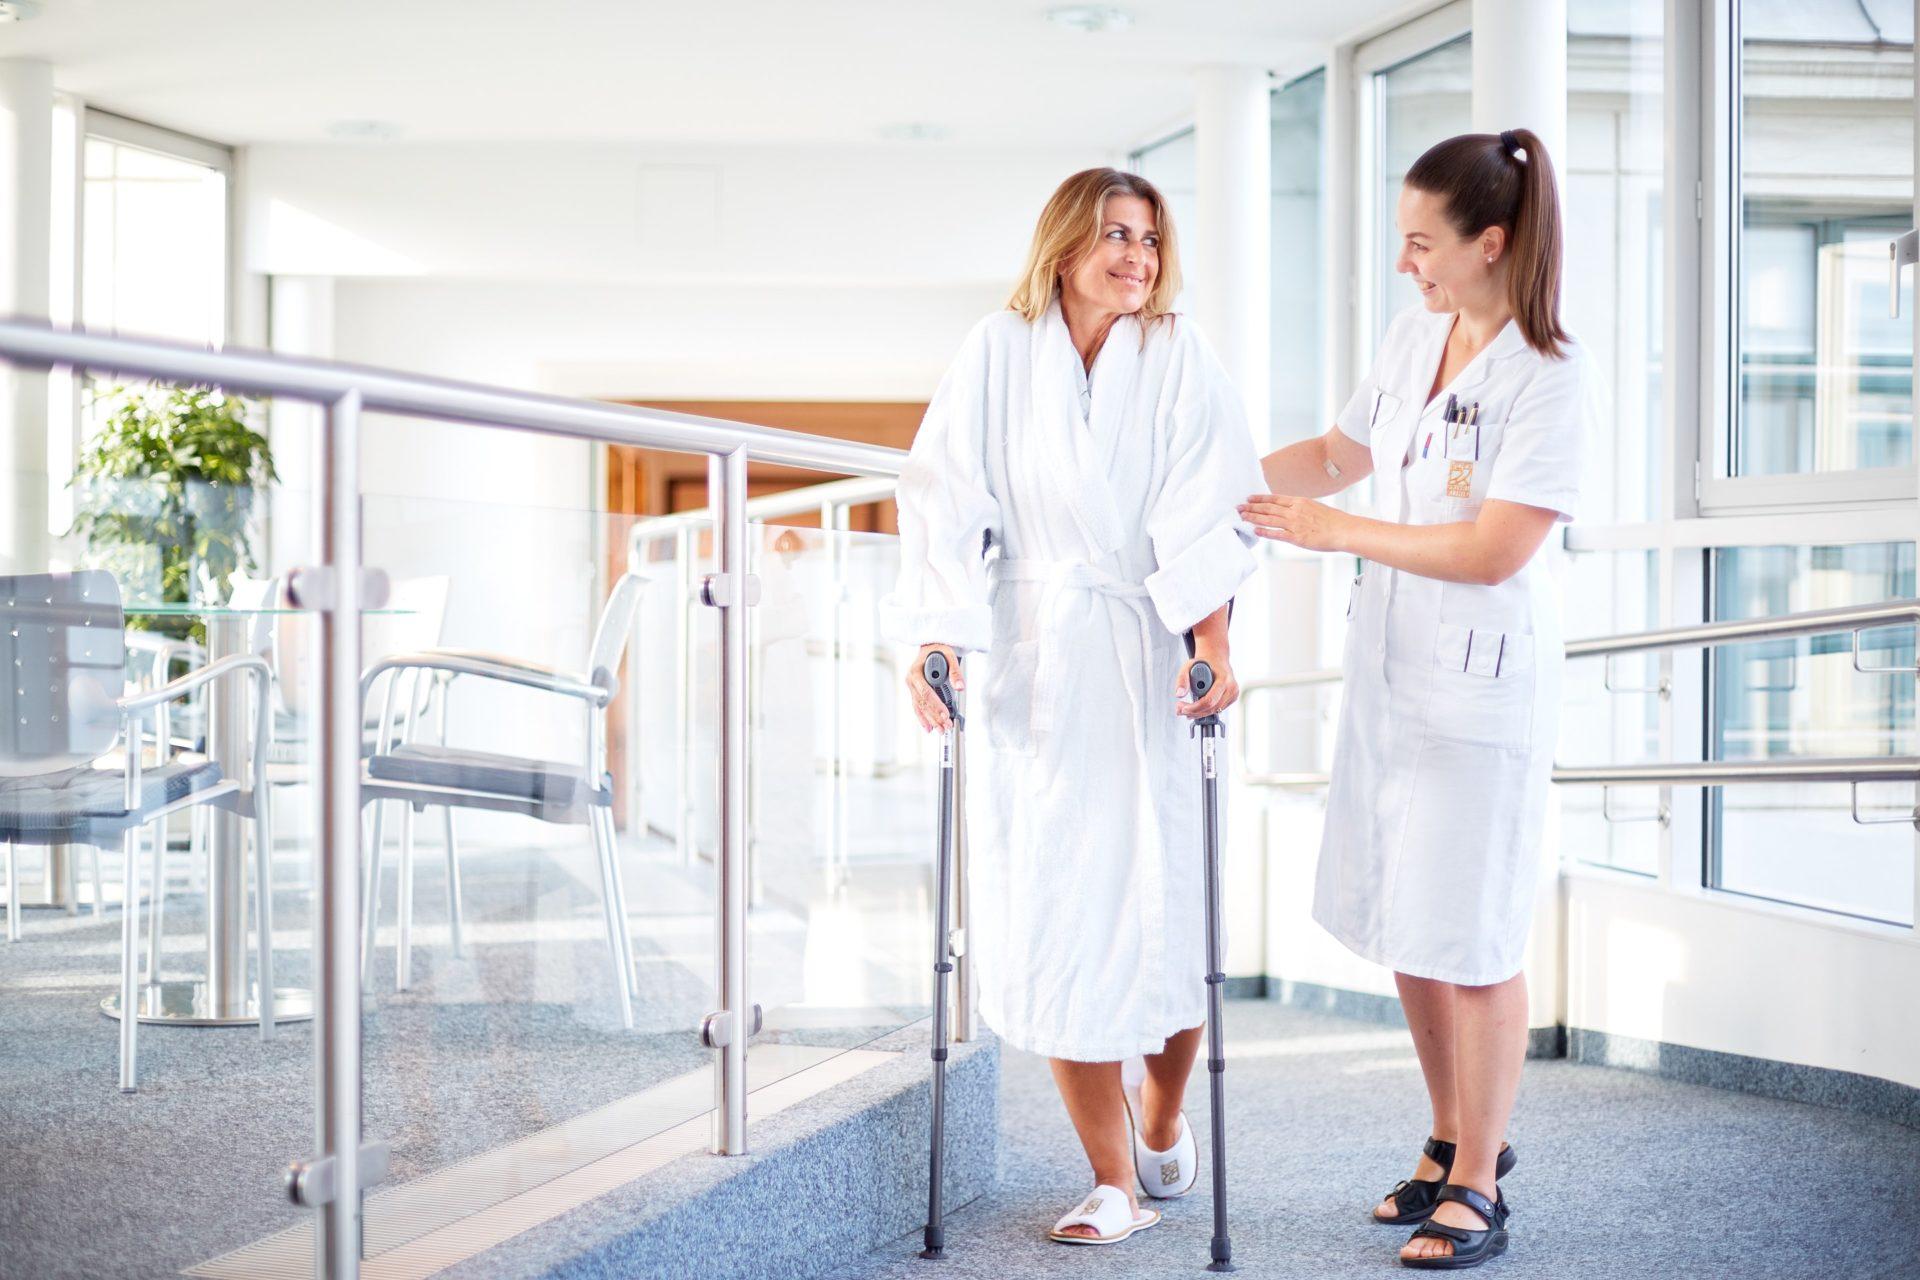 Patientenbegleitservice